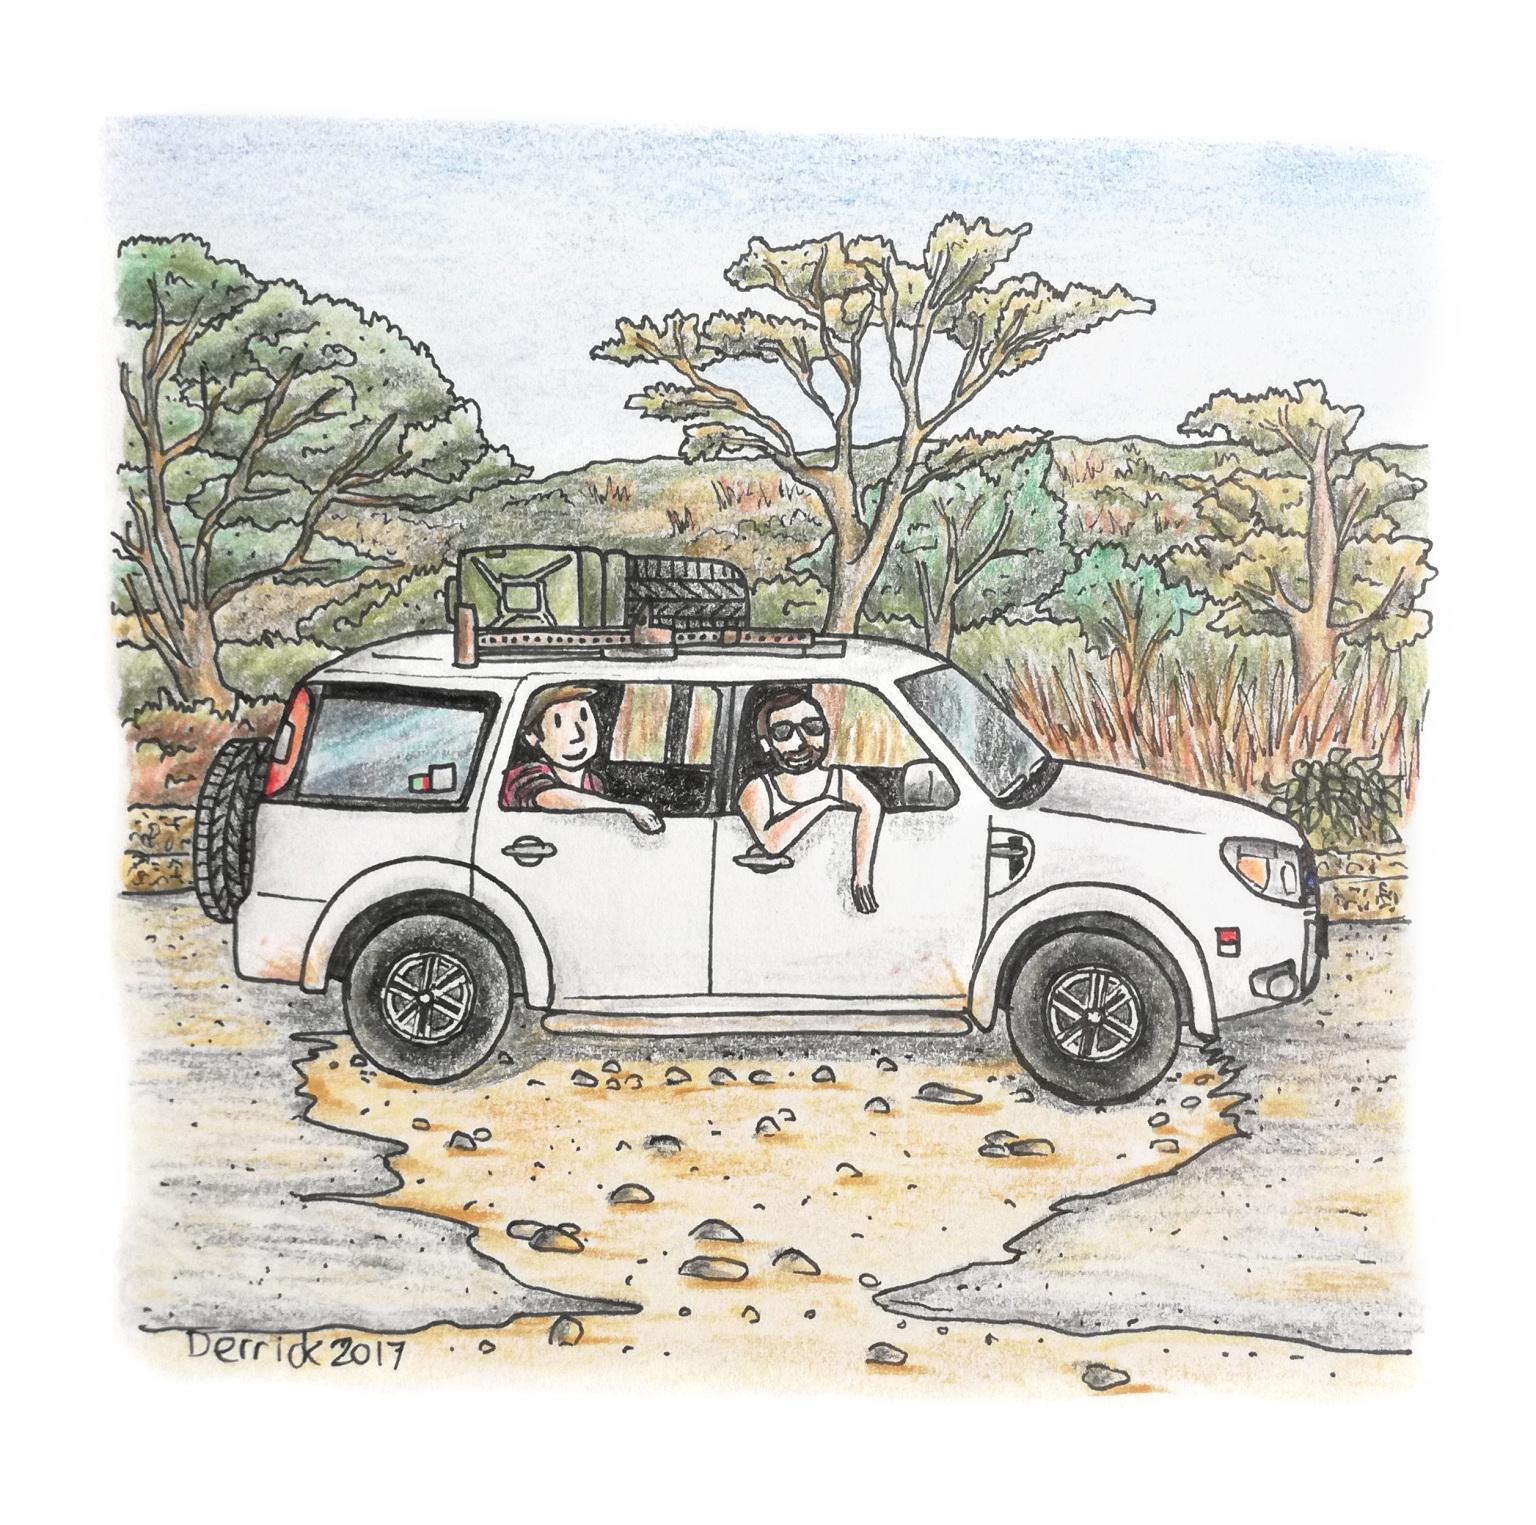 potholes sketch